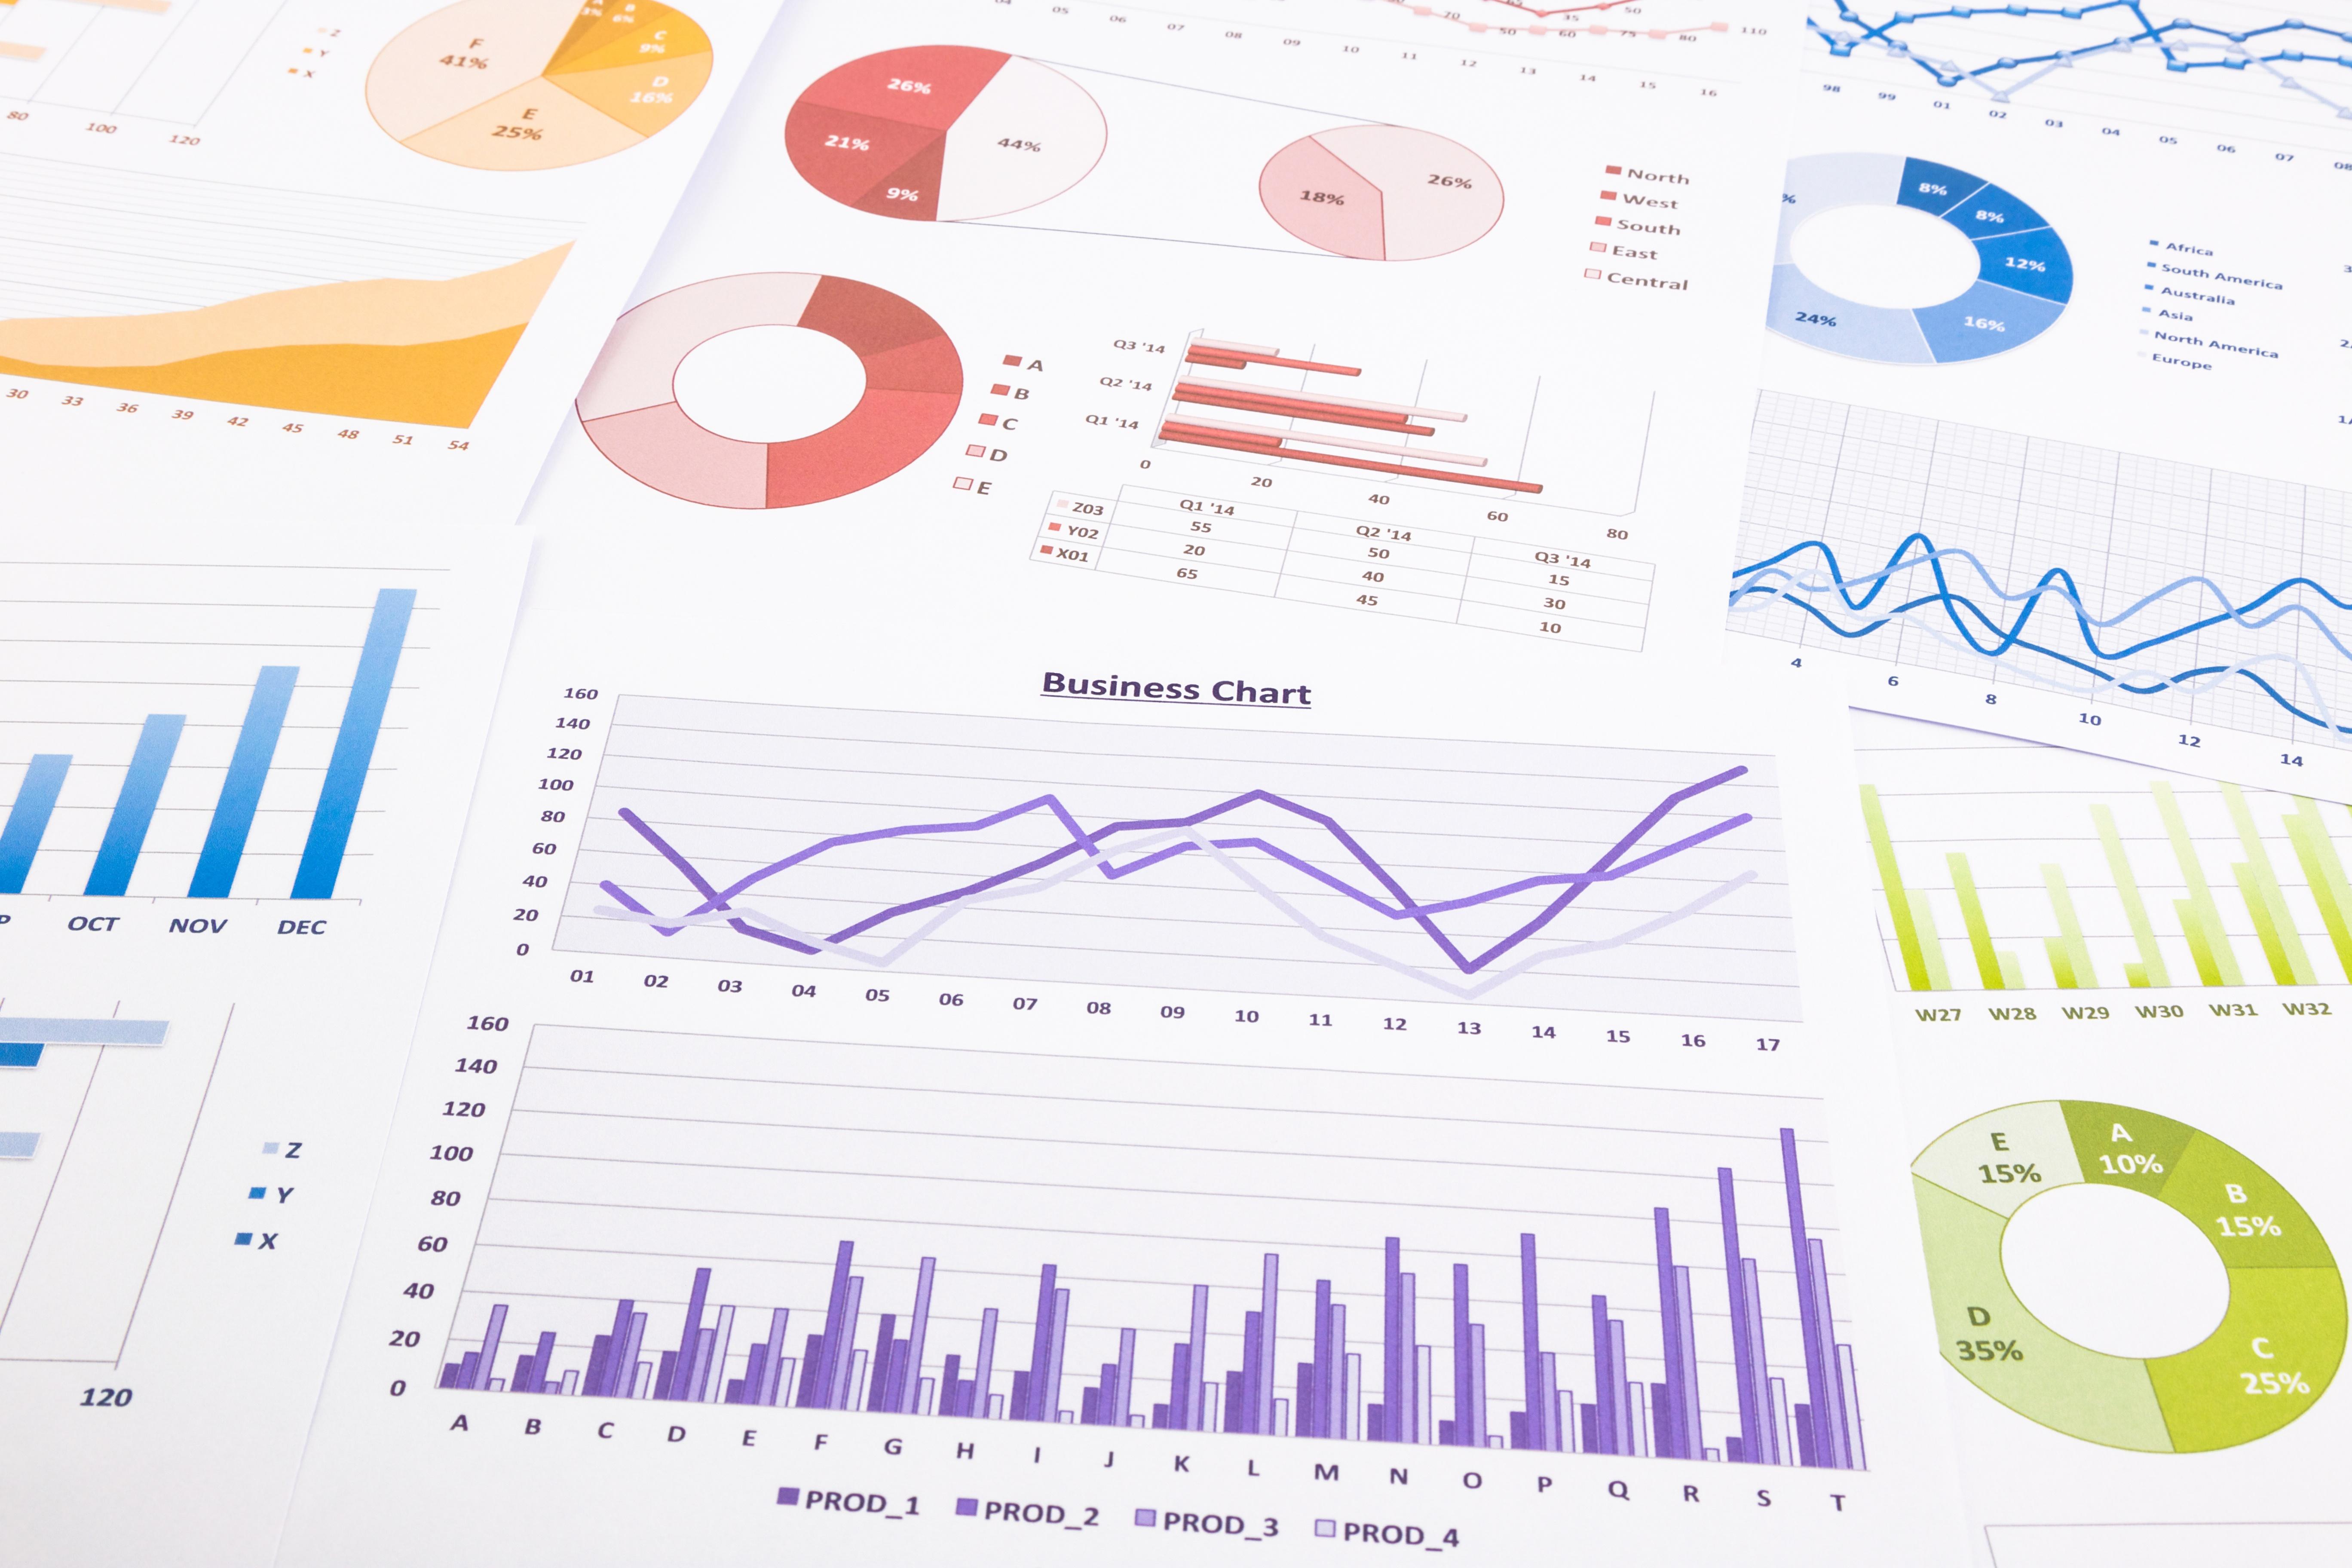 bigstock-Colorful-Graphs-Data-Analysis-68922151.jpg